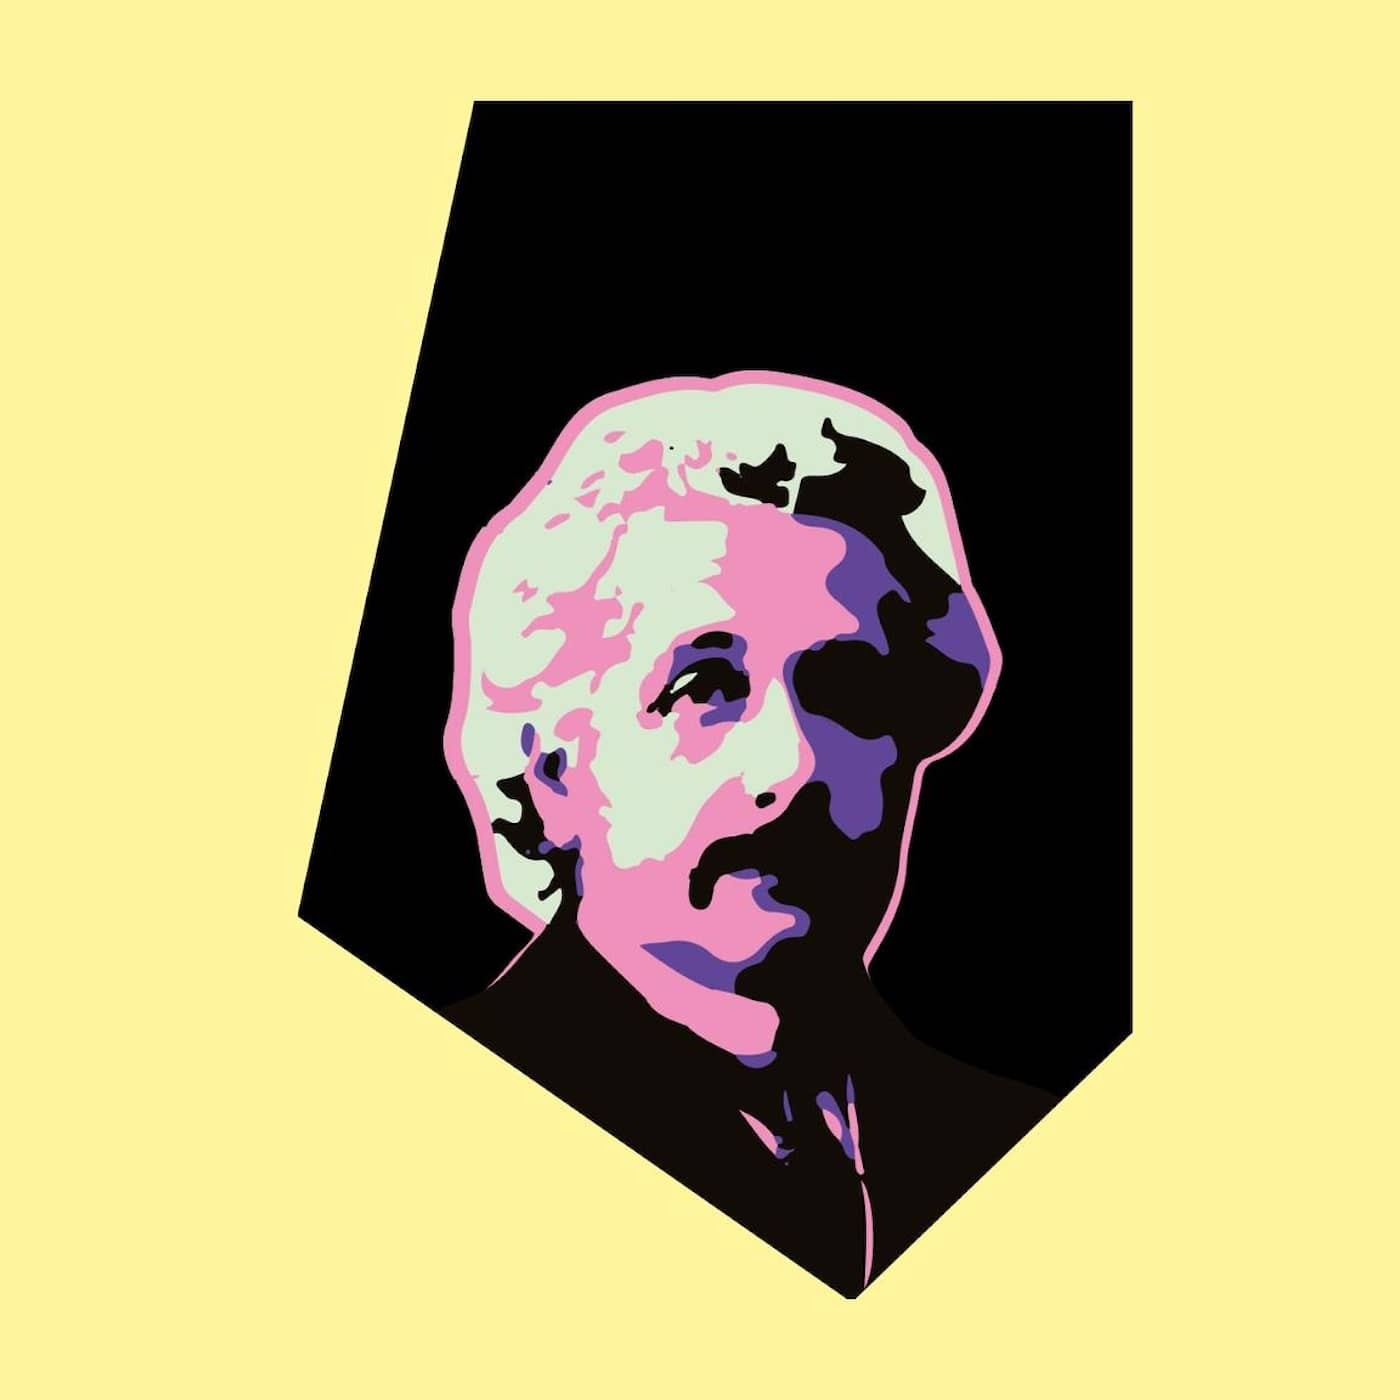 Albert Einstein - geni, pacifist och atombombens fader?